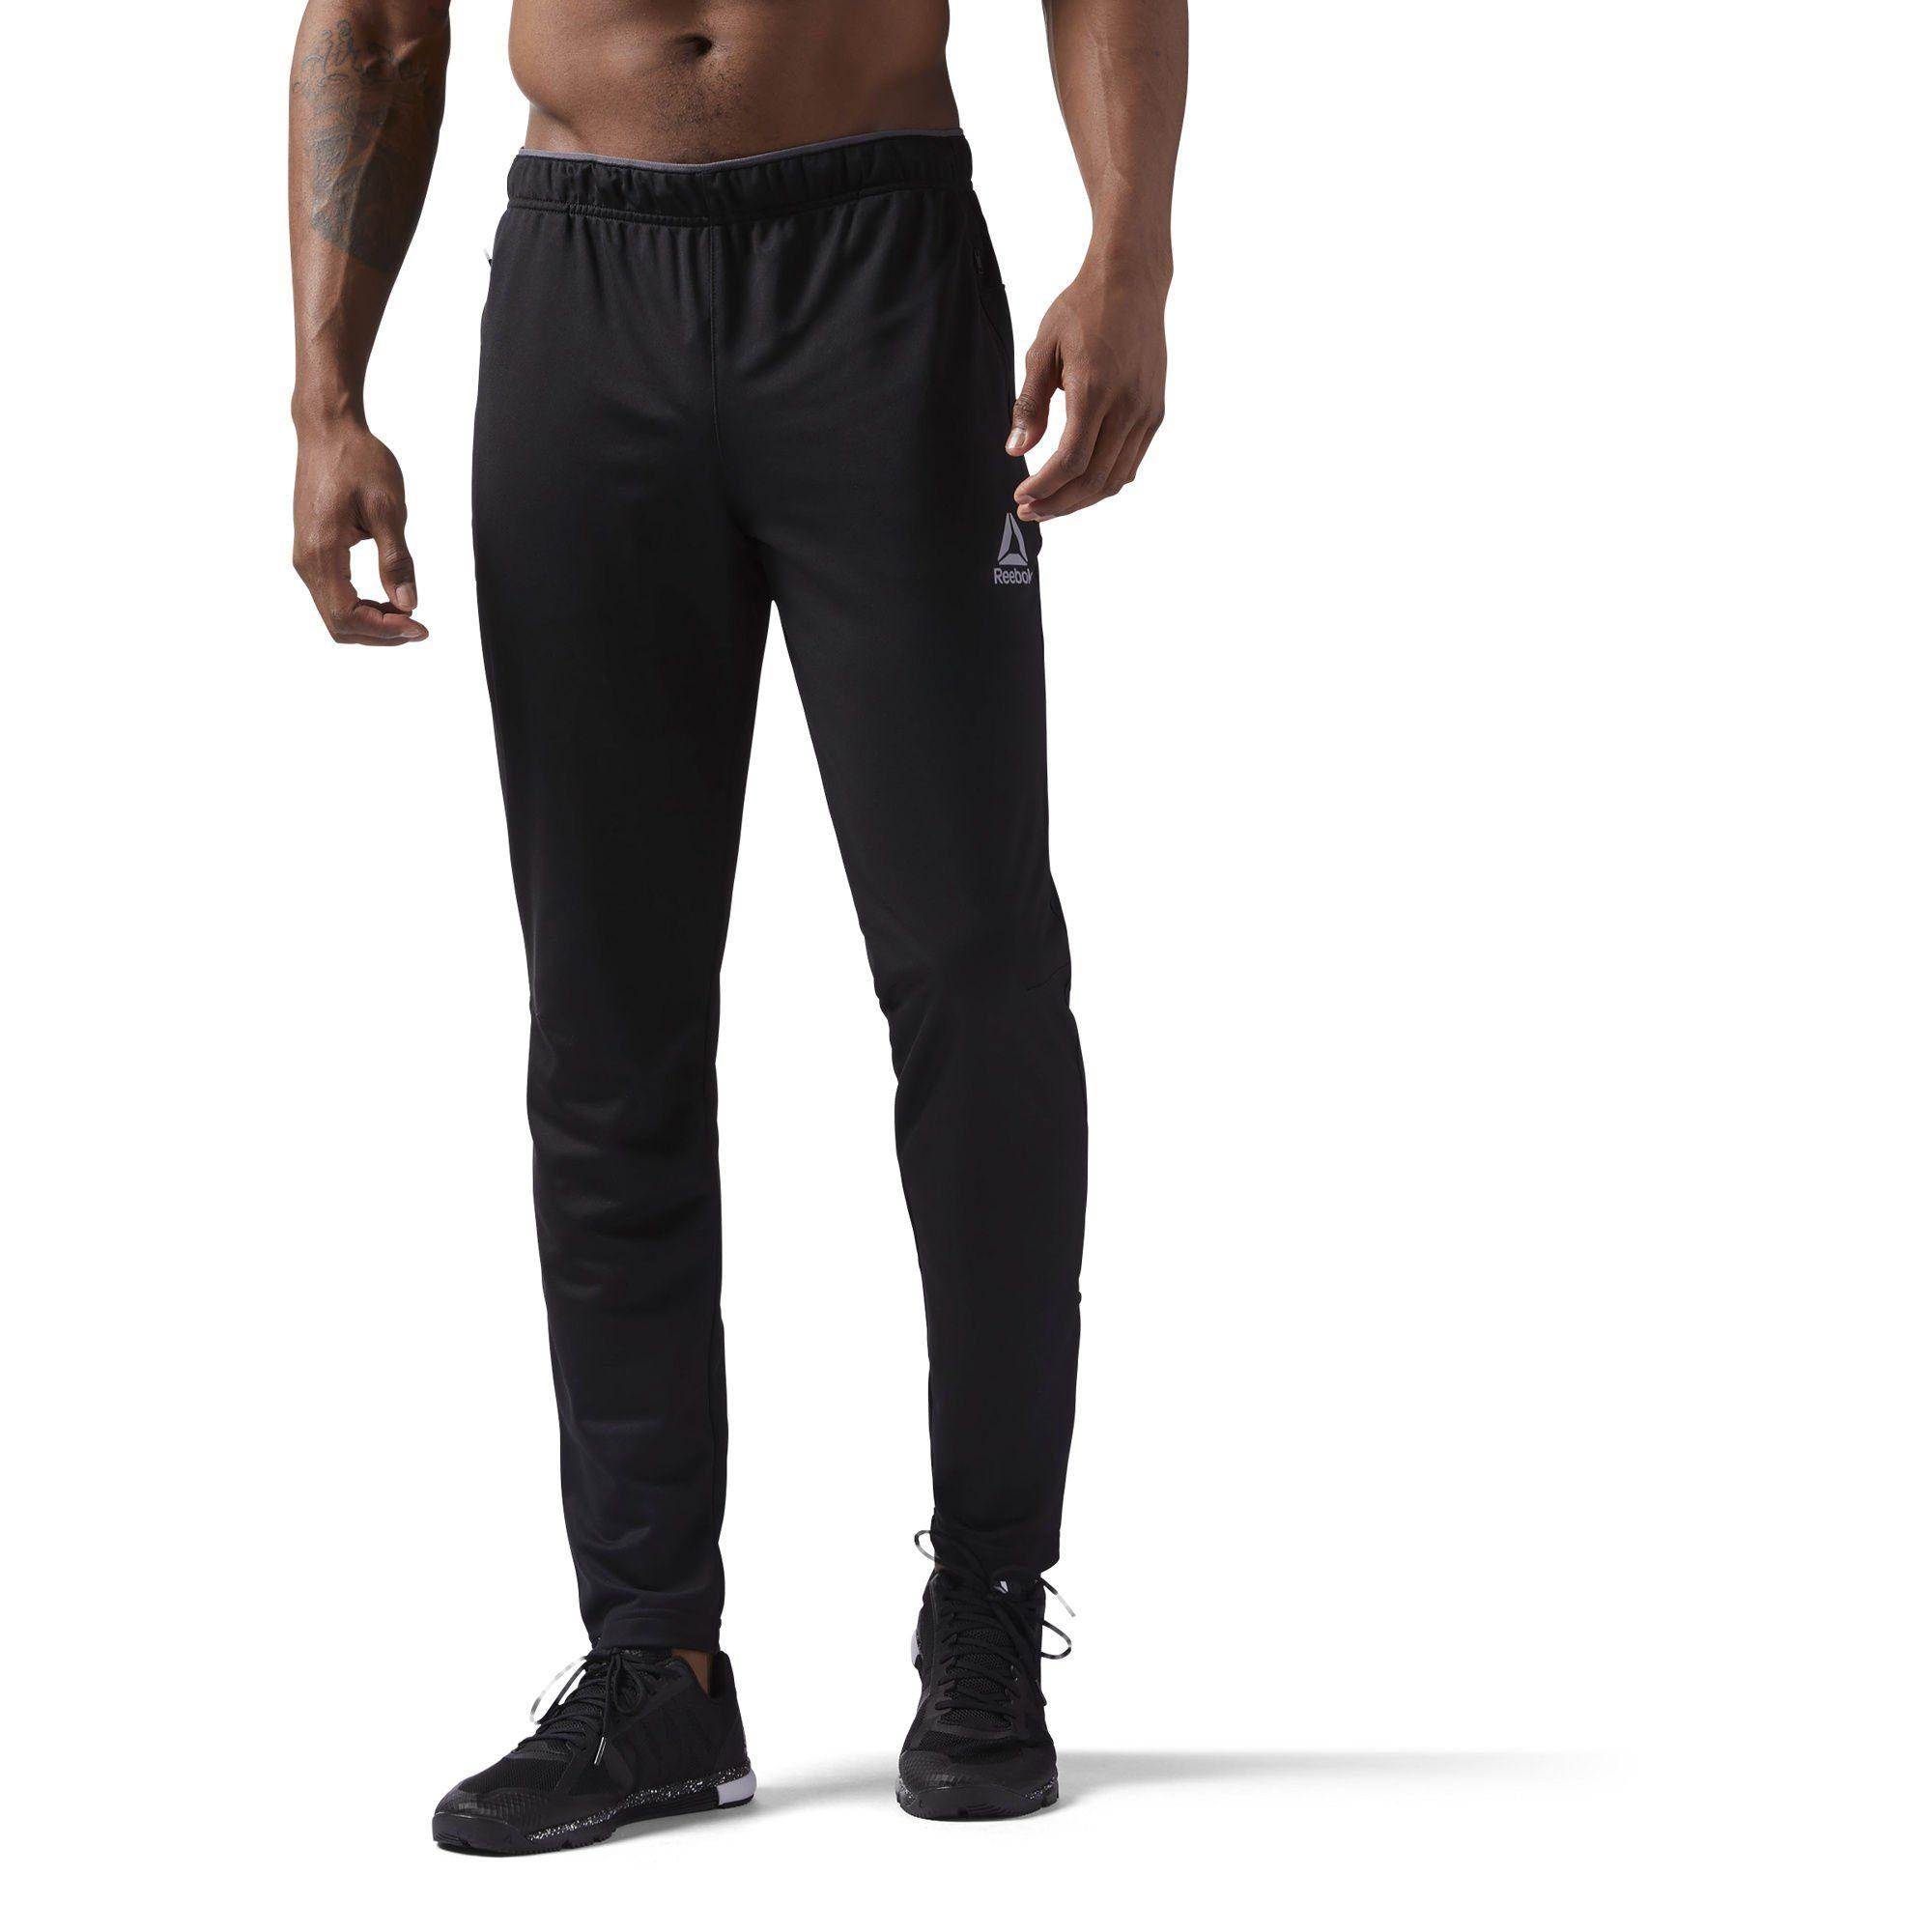 Reebok Sporthose »Workout Ready Trackster Pant«